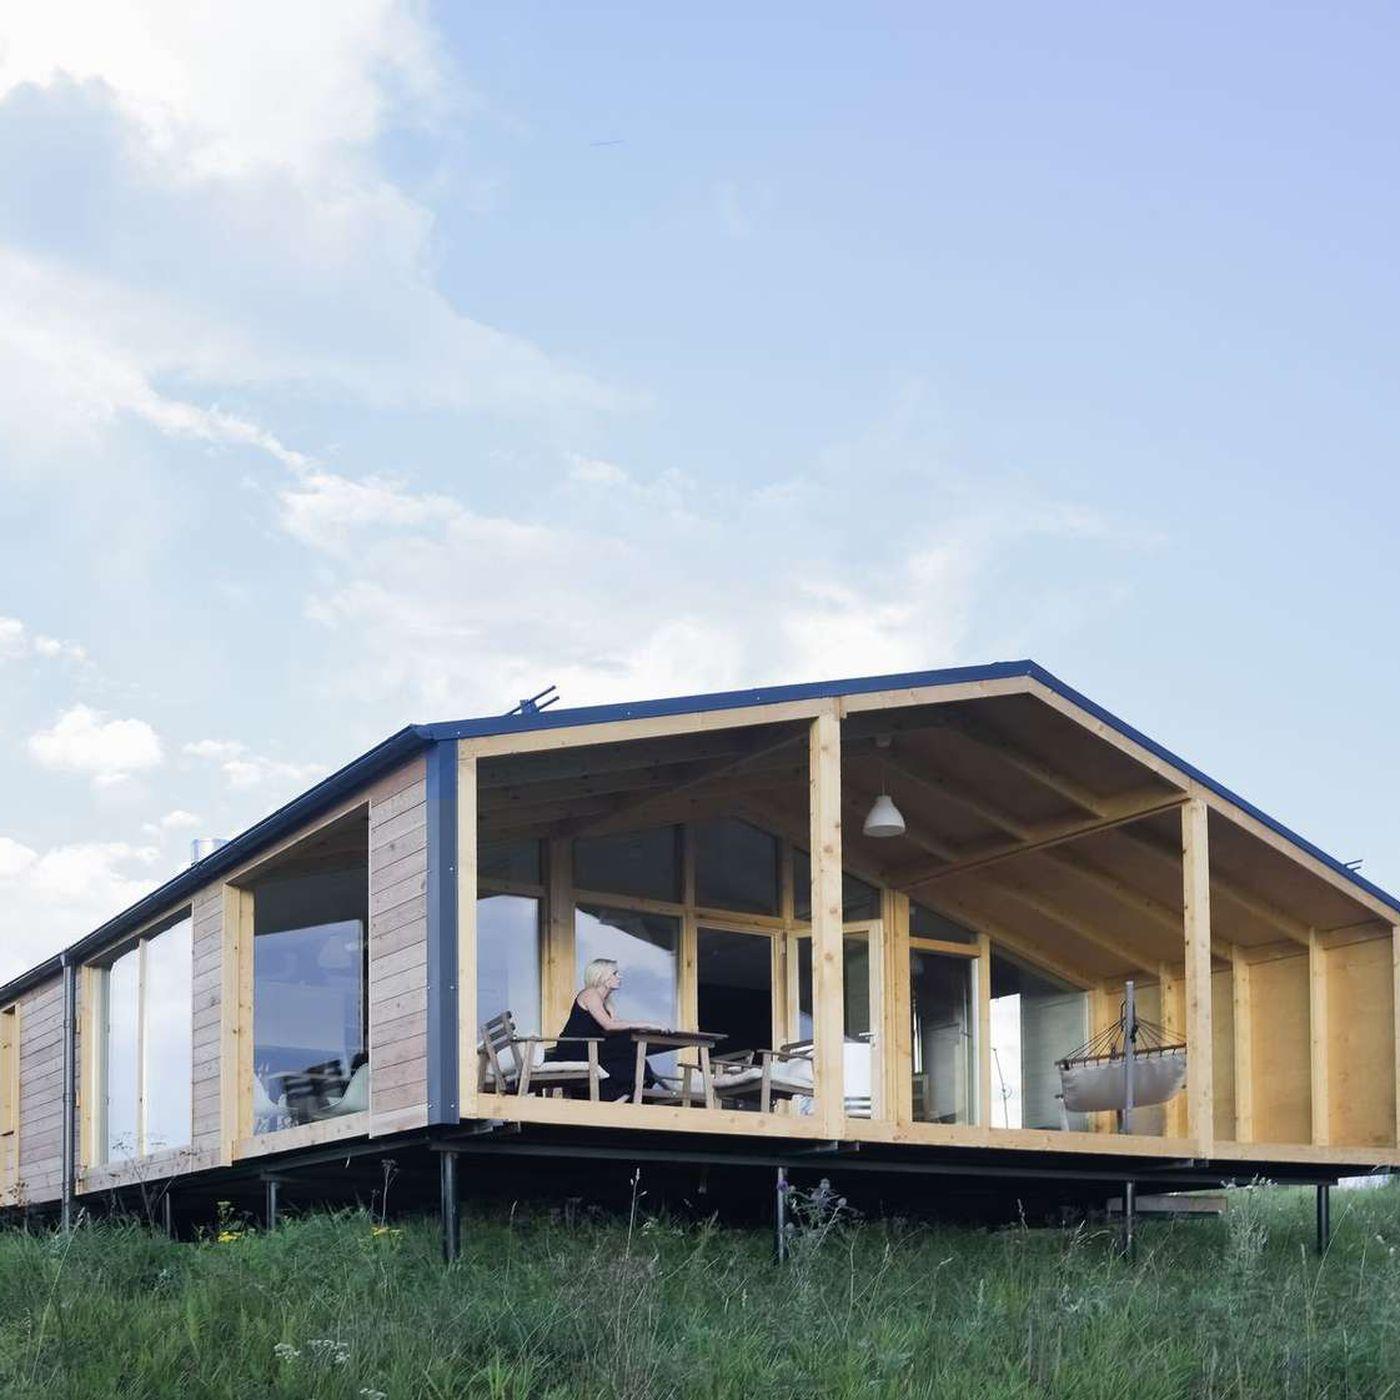 Affordable Prefab Cabin Dubldom Now Accepting U S Pre Orders Curbed